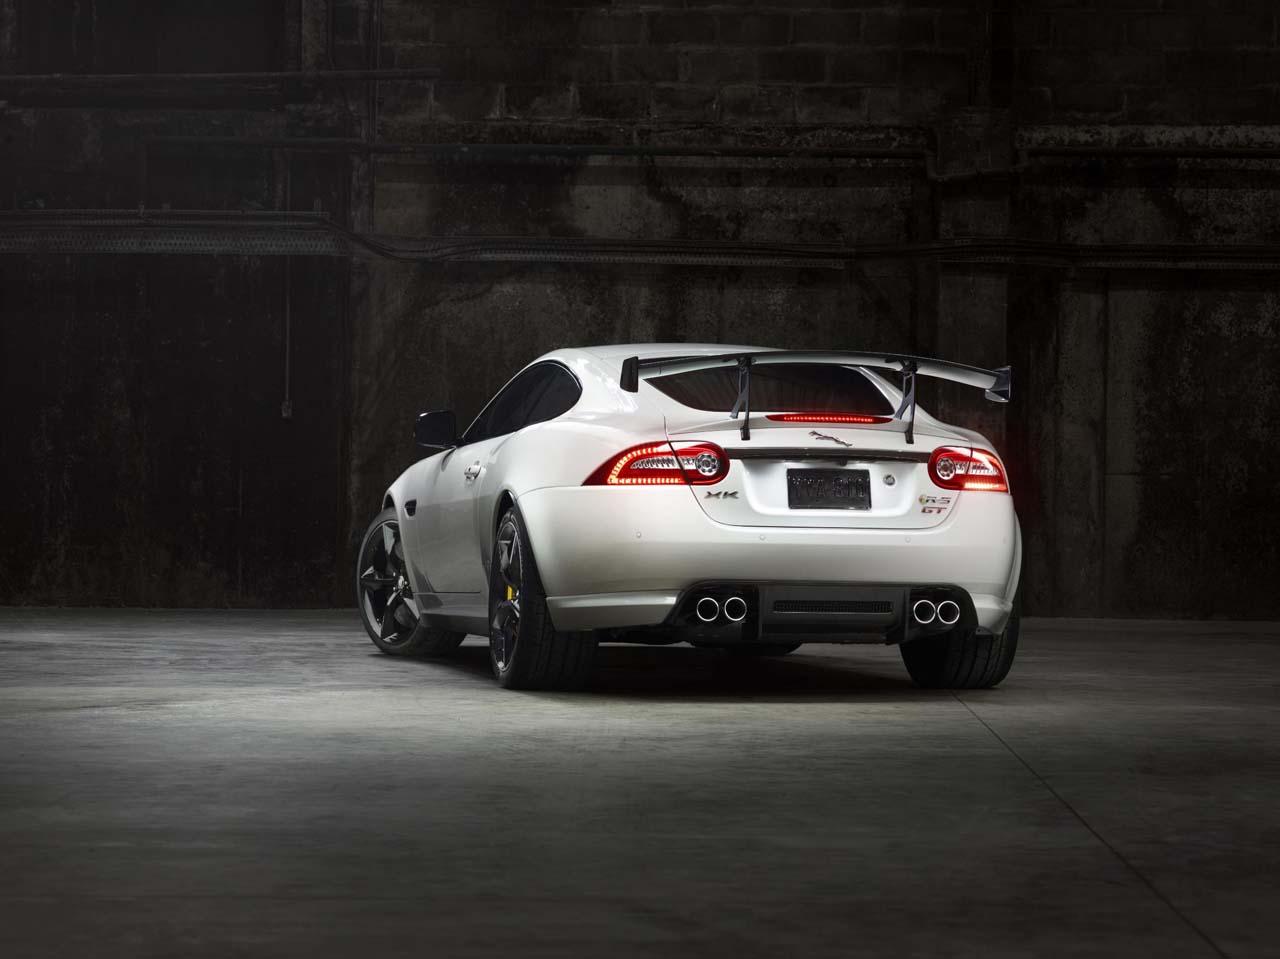 http://www.diseno-art.com/news_content/wp-content/uploads/2013/03/Jaguar-XKR-S-GT-5.jpg